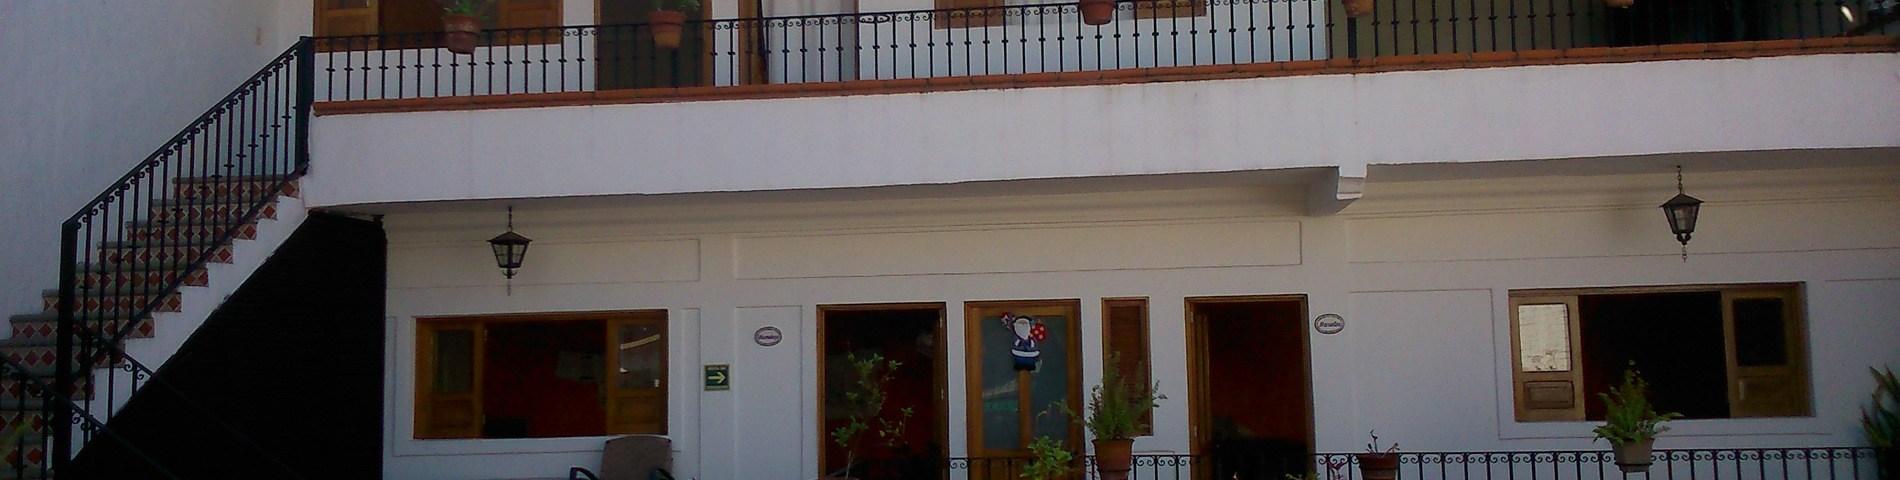 Imatge 1 de l'escola Spanish Experience Center